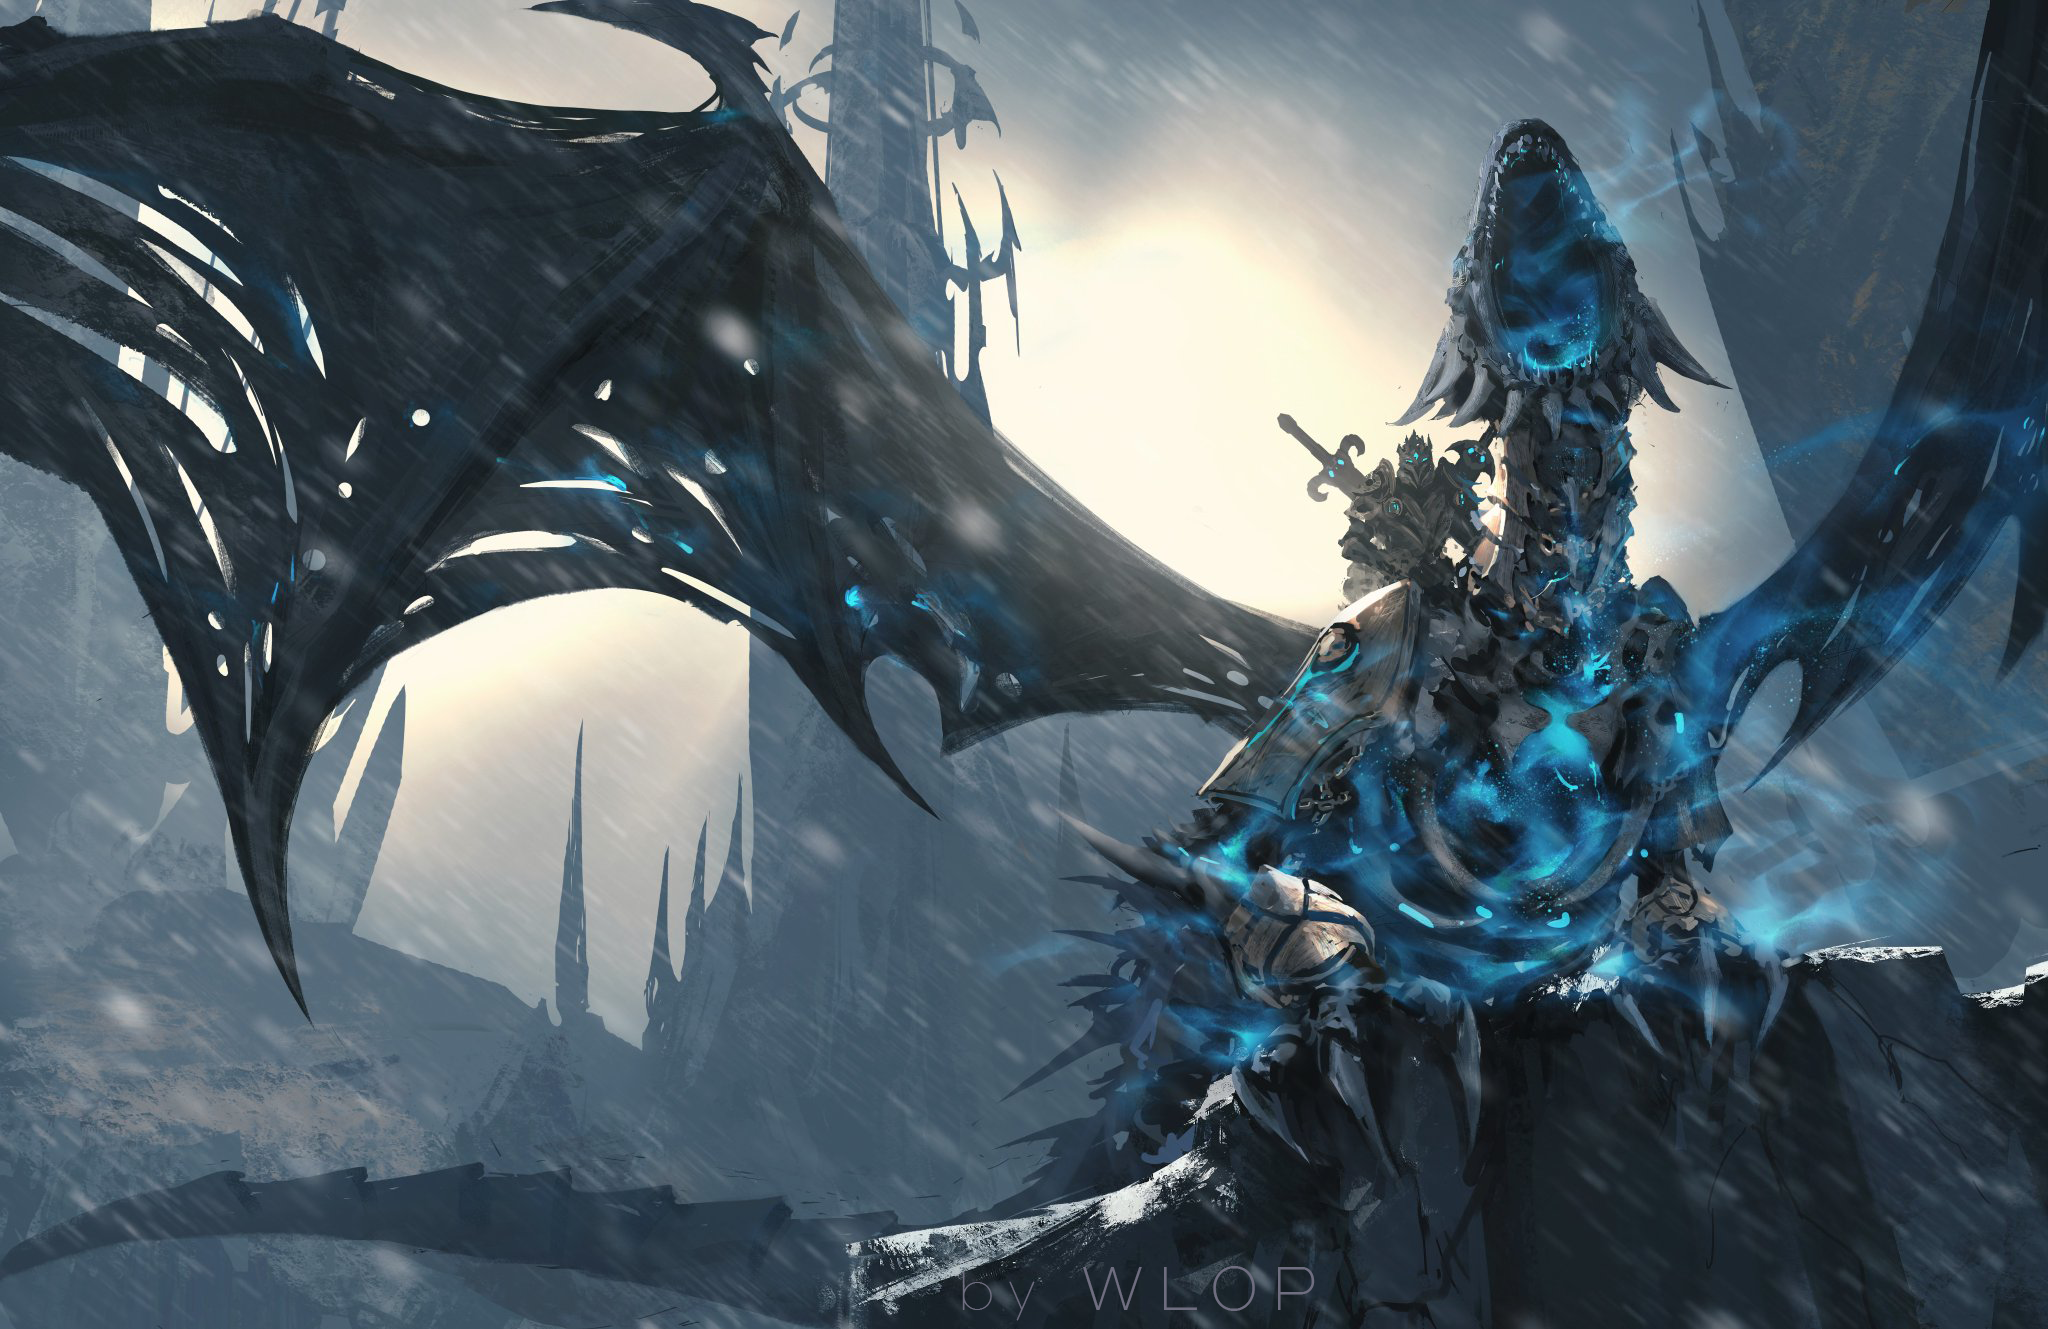 General 2048x1329 digital art artwork WLOP video games Warcraft dragon Sindragosa World of Warcraft PC gaming fantasy art Arthas Menethil